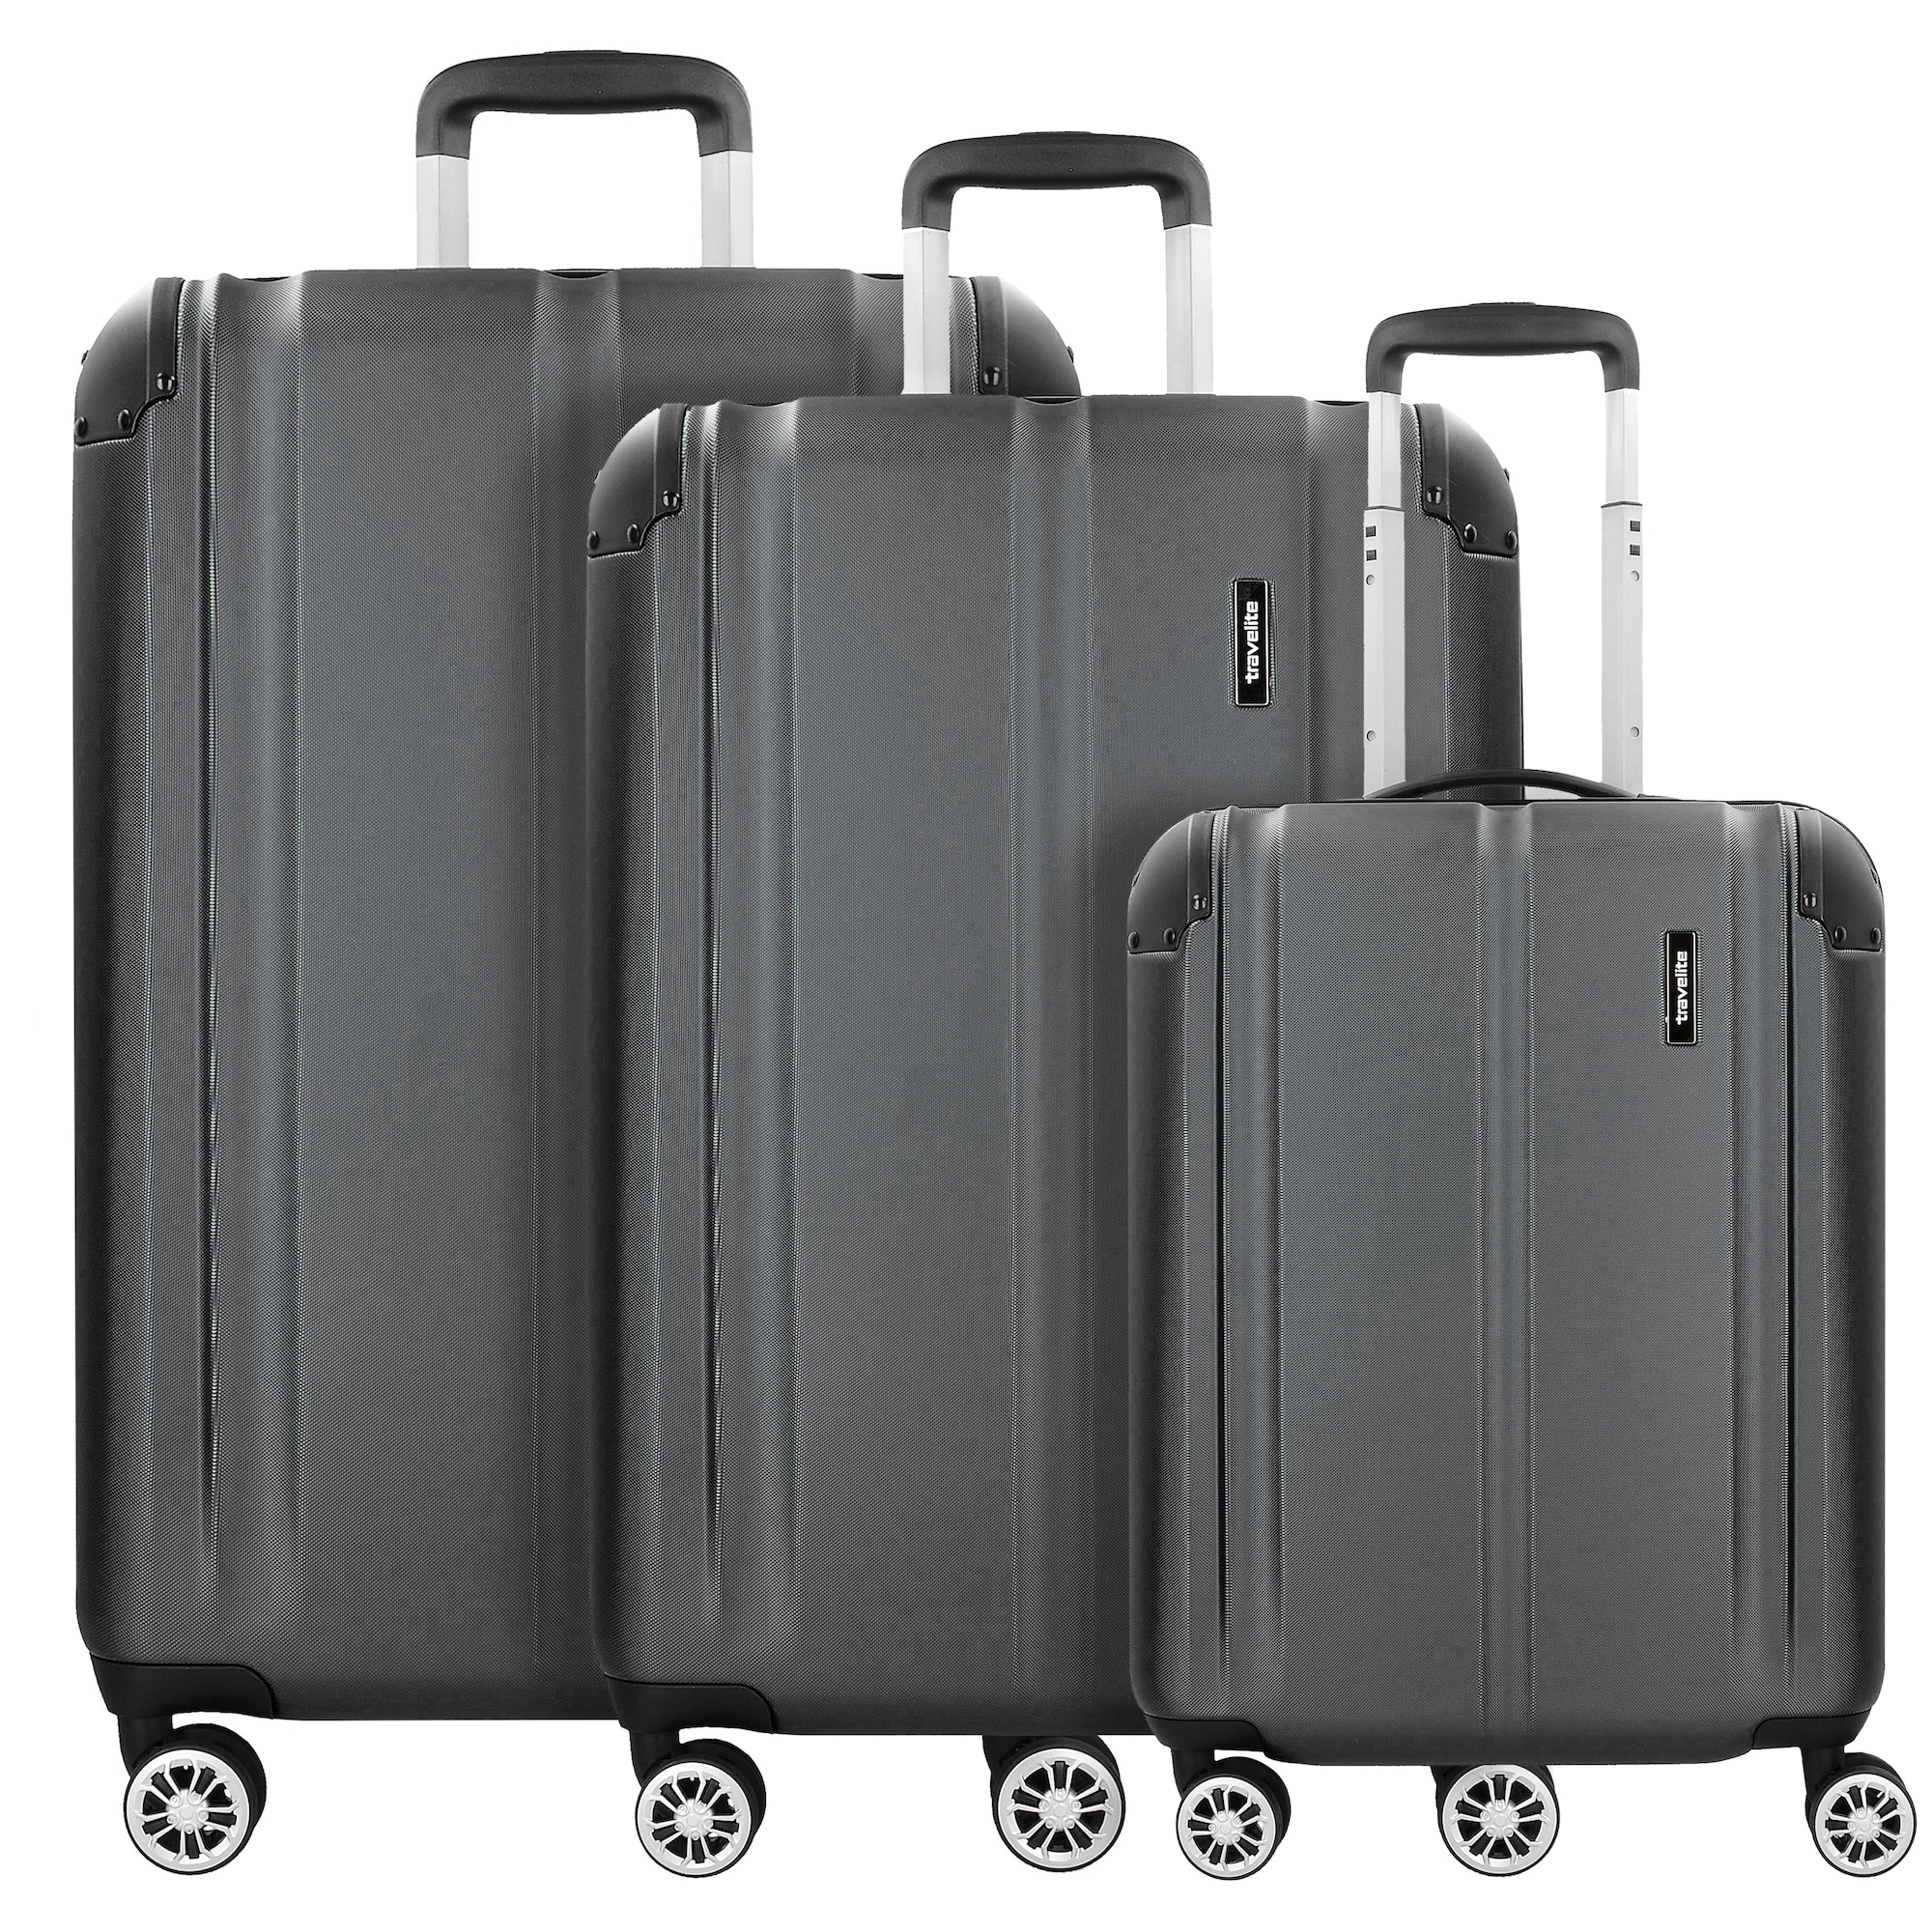 Kofferset | Taschen > Koffer & Trolleys > Koffersets | Travelite